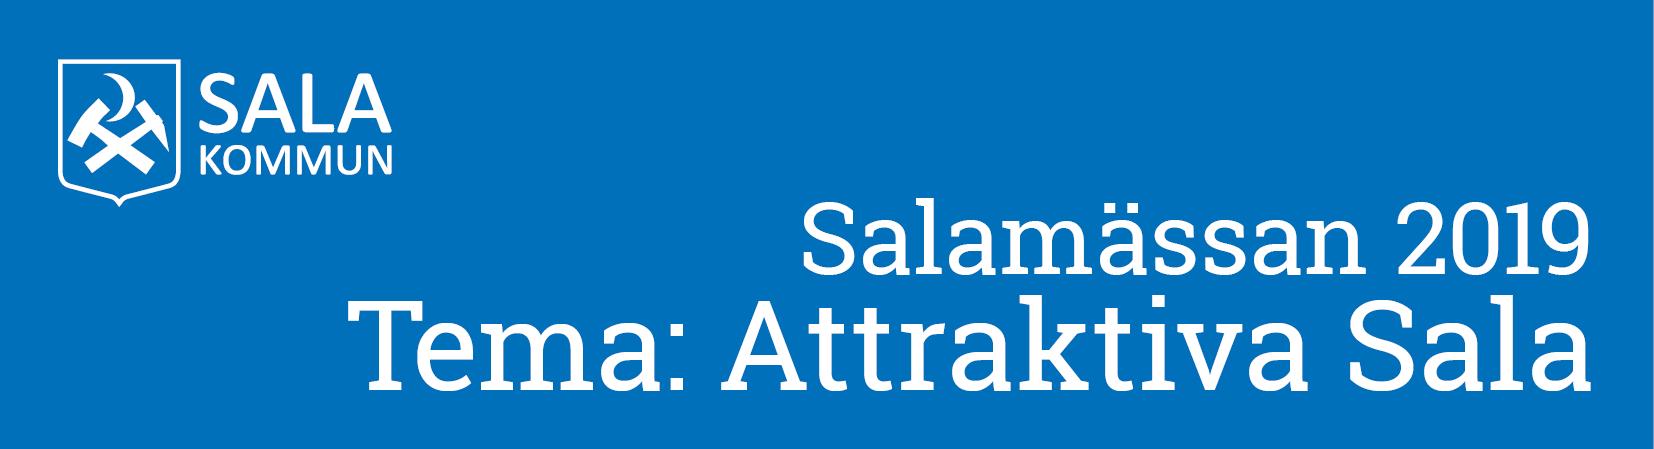 Salamässan 2019: Attraktiva Sala